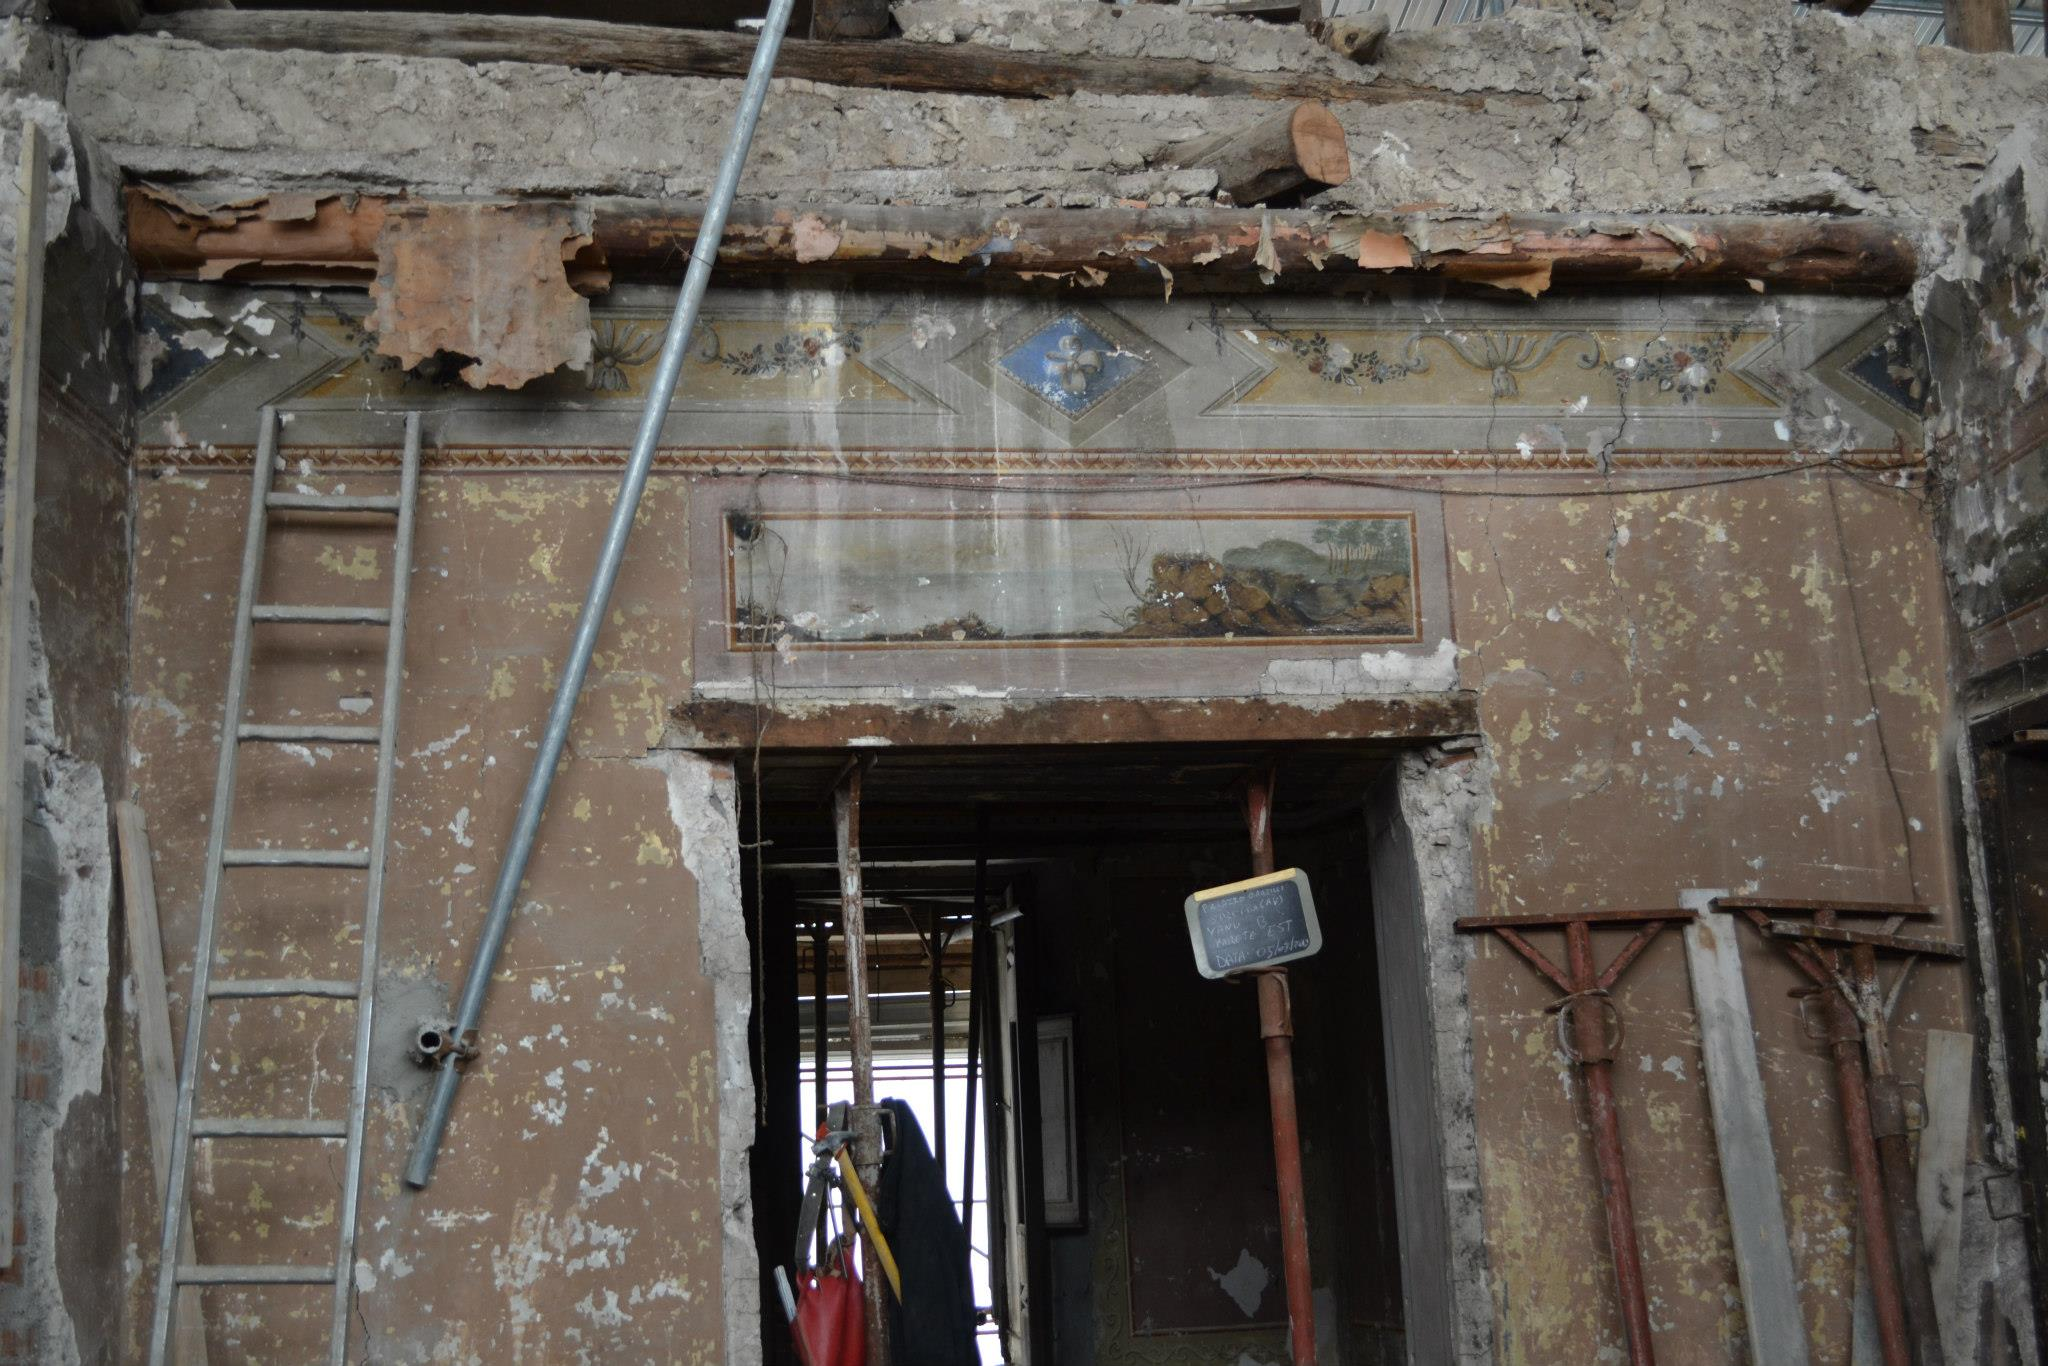 Palazzo Garzilli Solofra (AV) - Distacchi di pitture murali